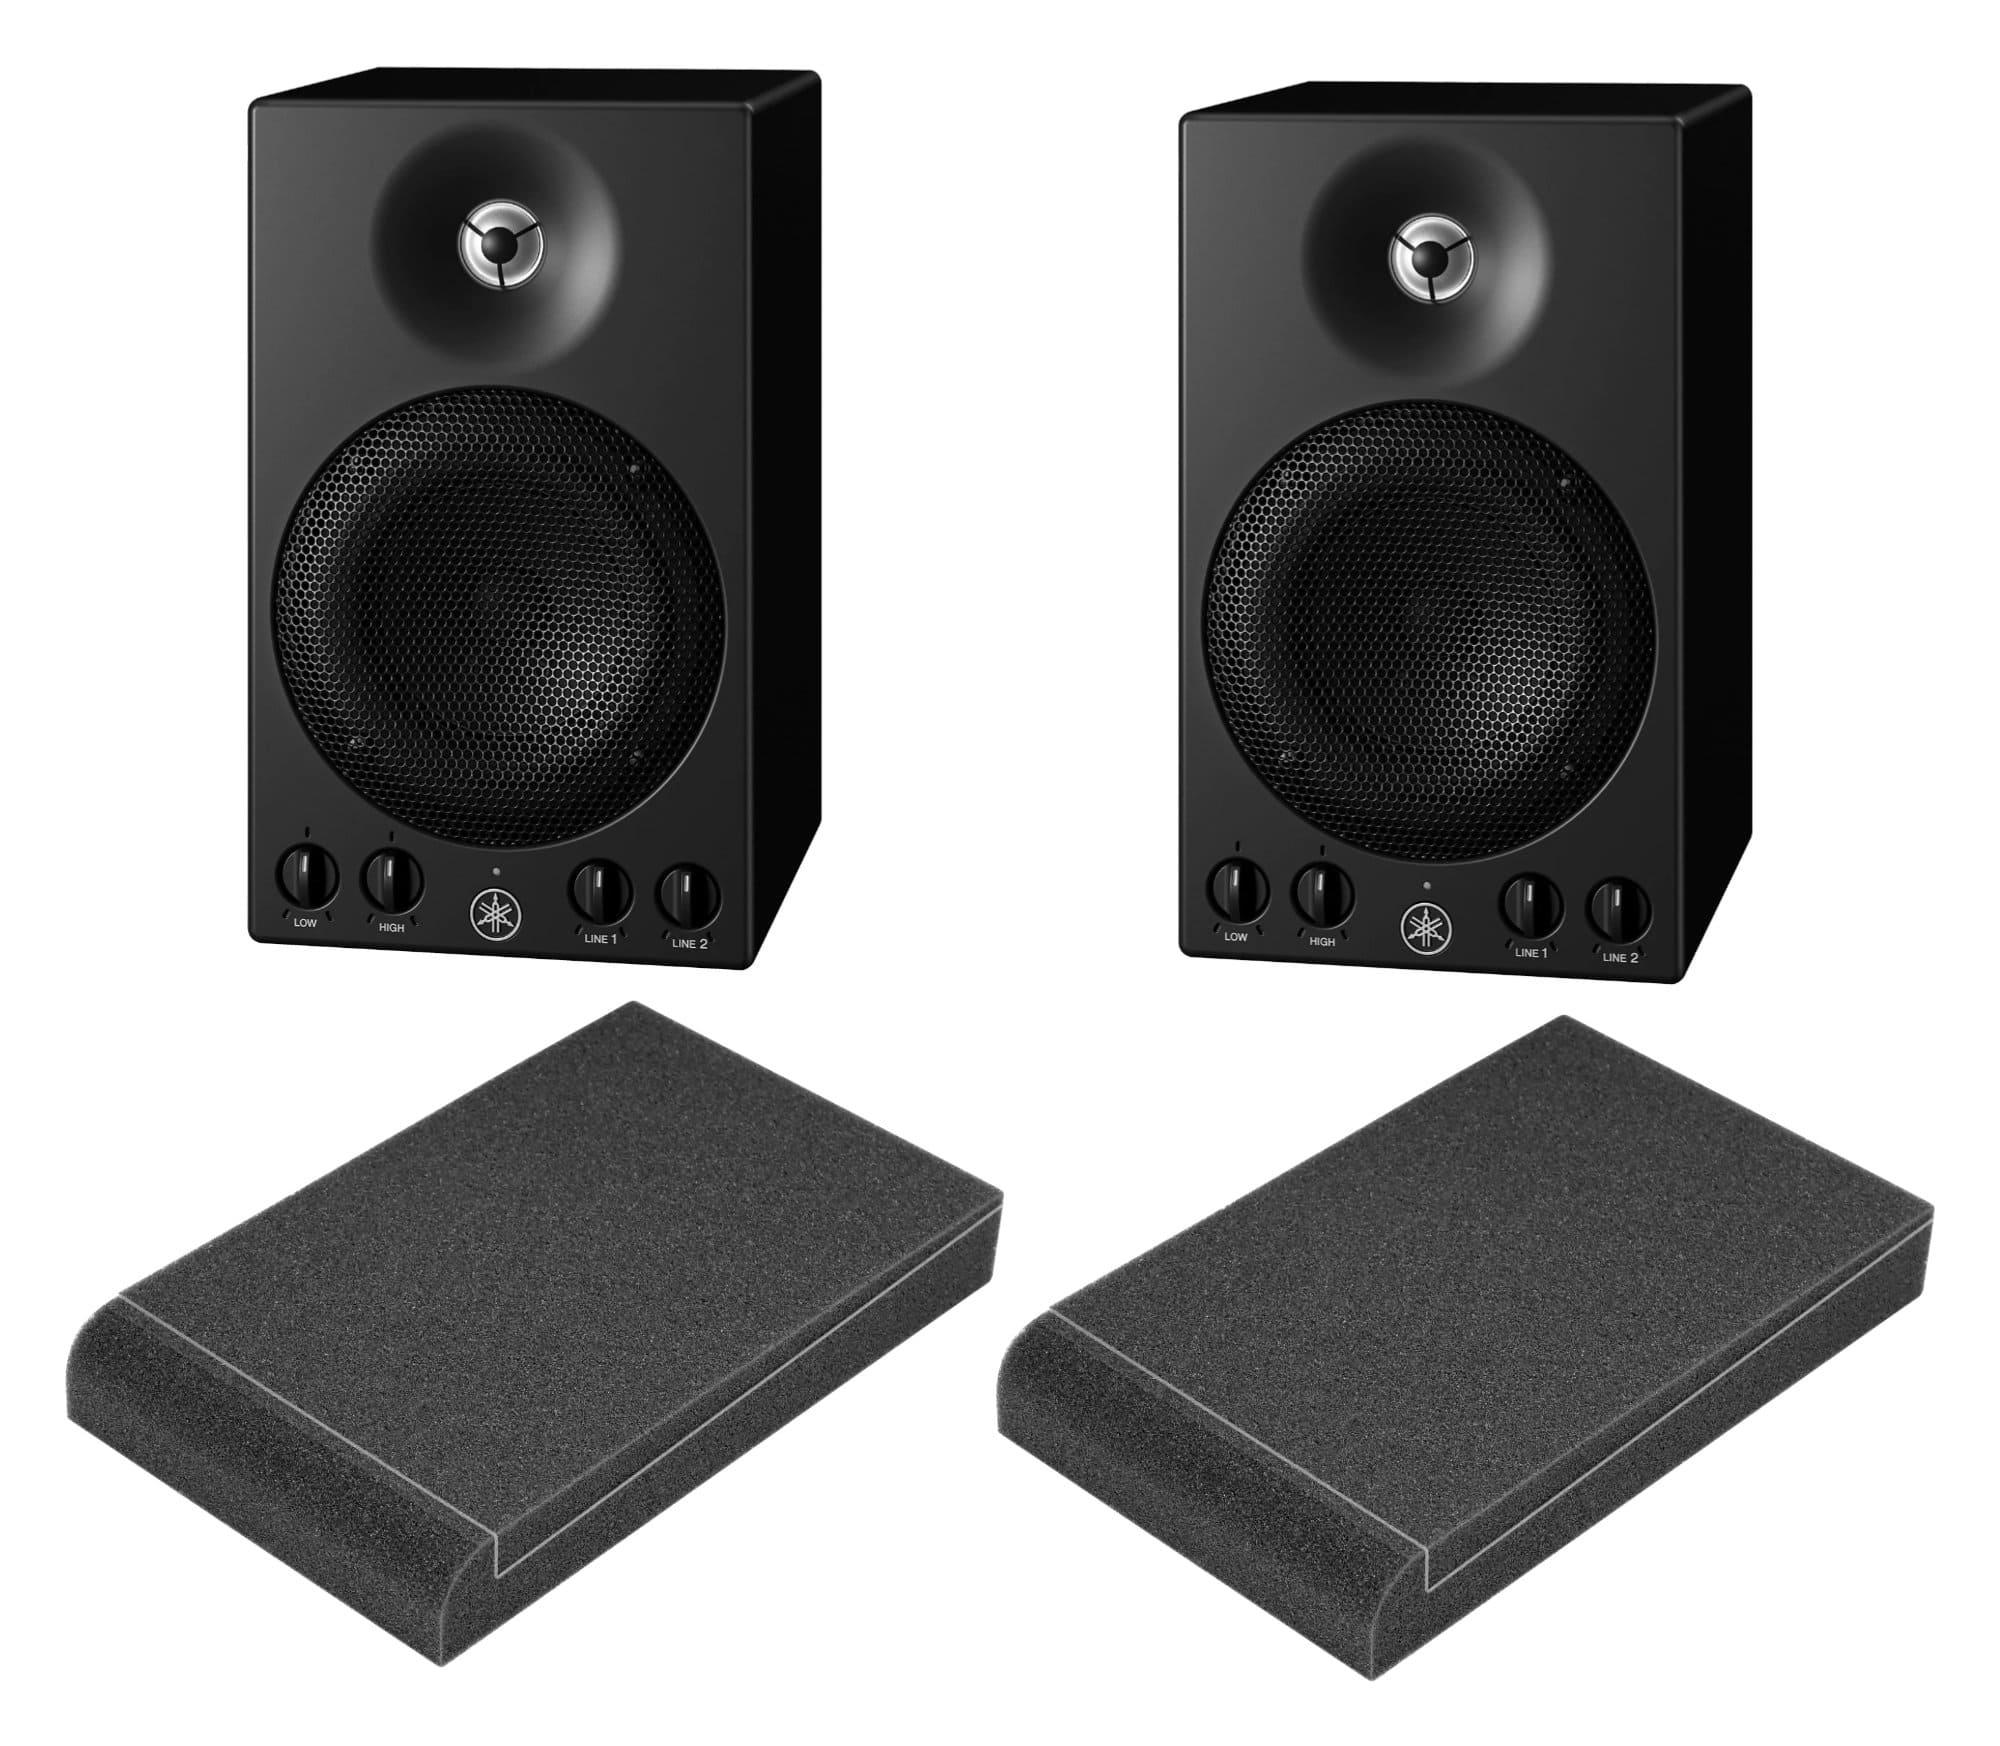 Studiomonitore - Yamaha MSP3A Aktiver Studiomonitor ISO Set - Onlineshop Musikhaus Kirstein